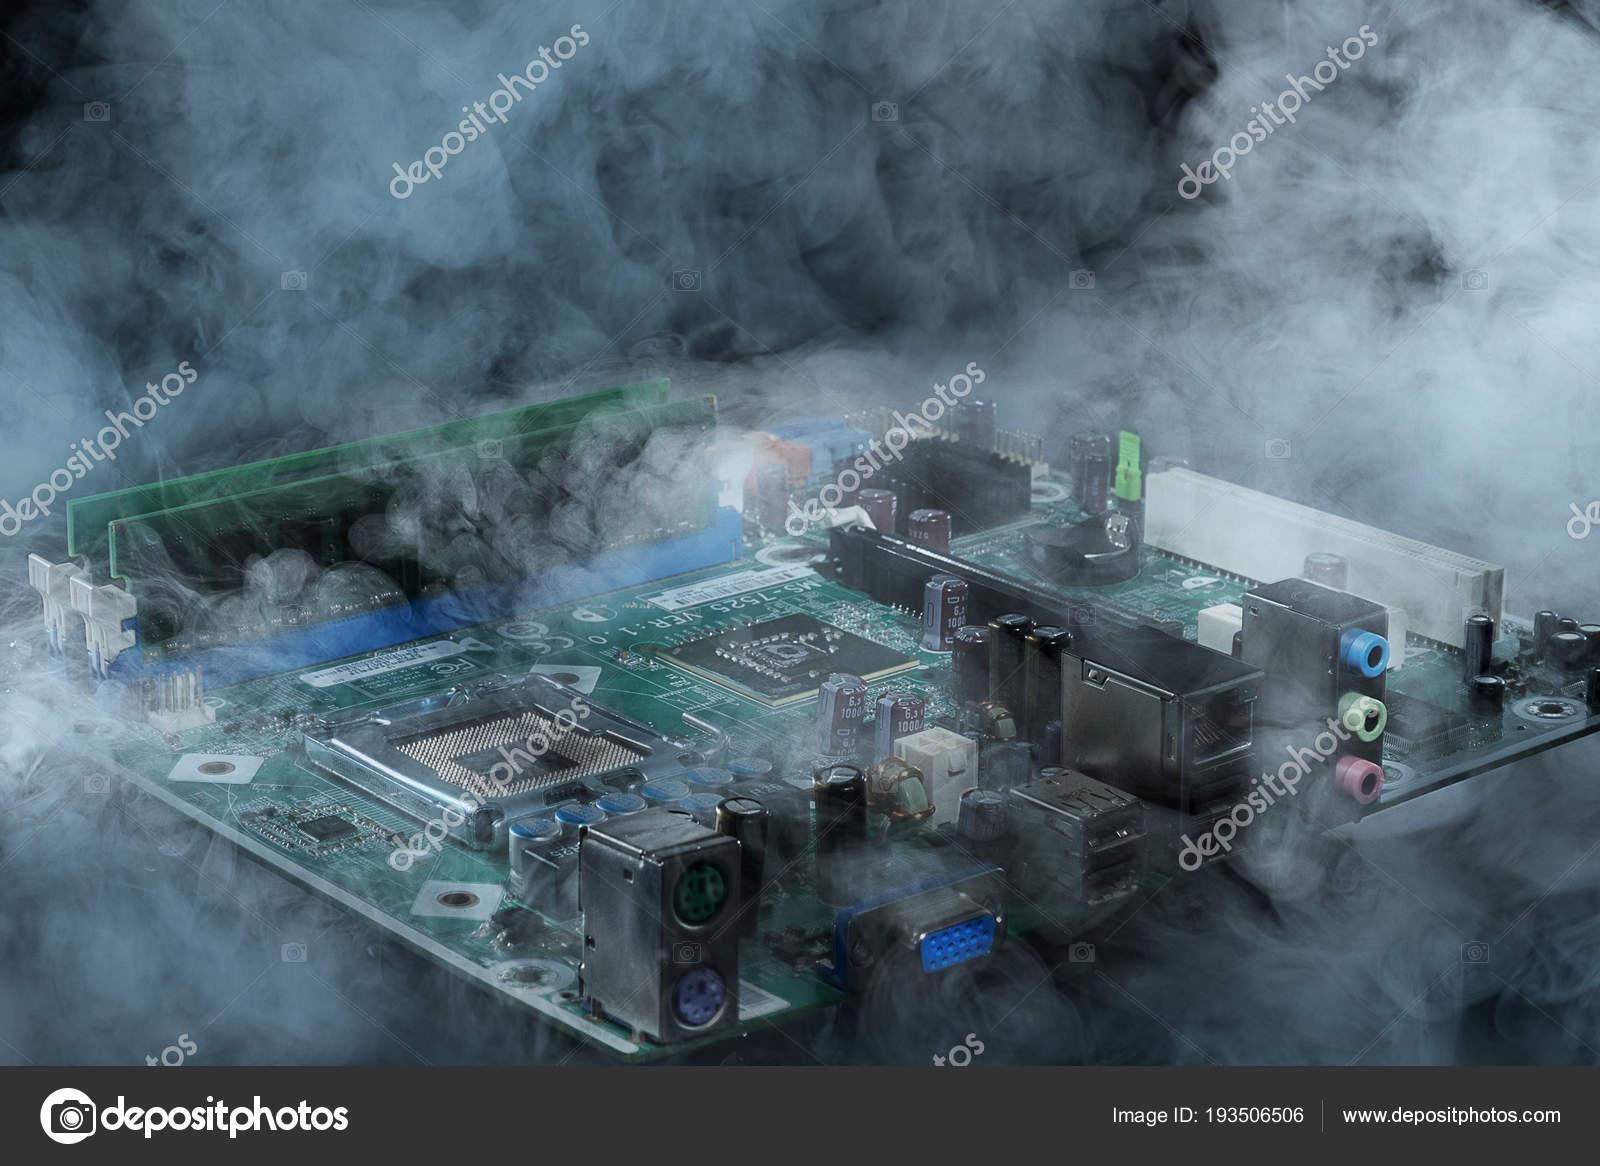 computer in smoke — Stock Photo © ALEXGRAF1954 #193506506